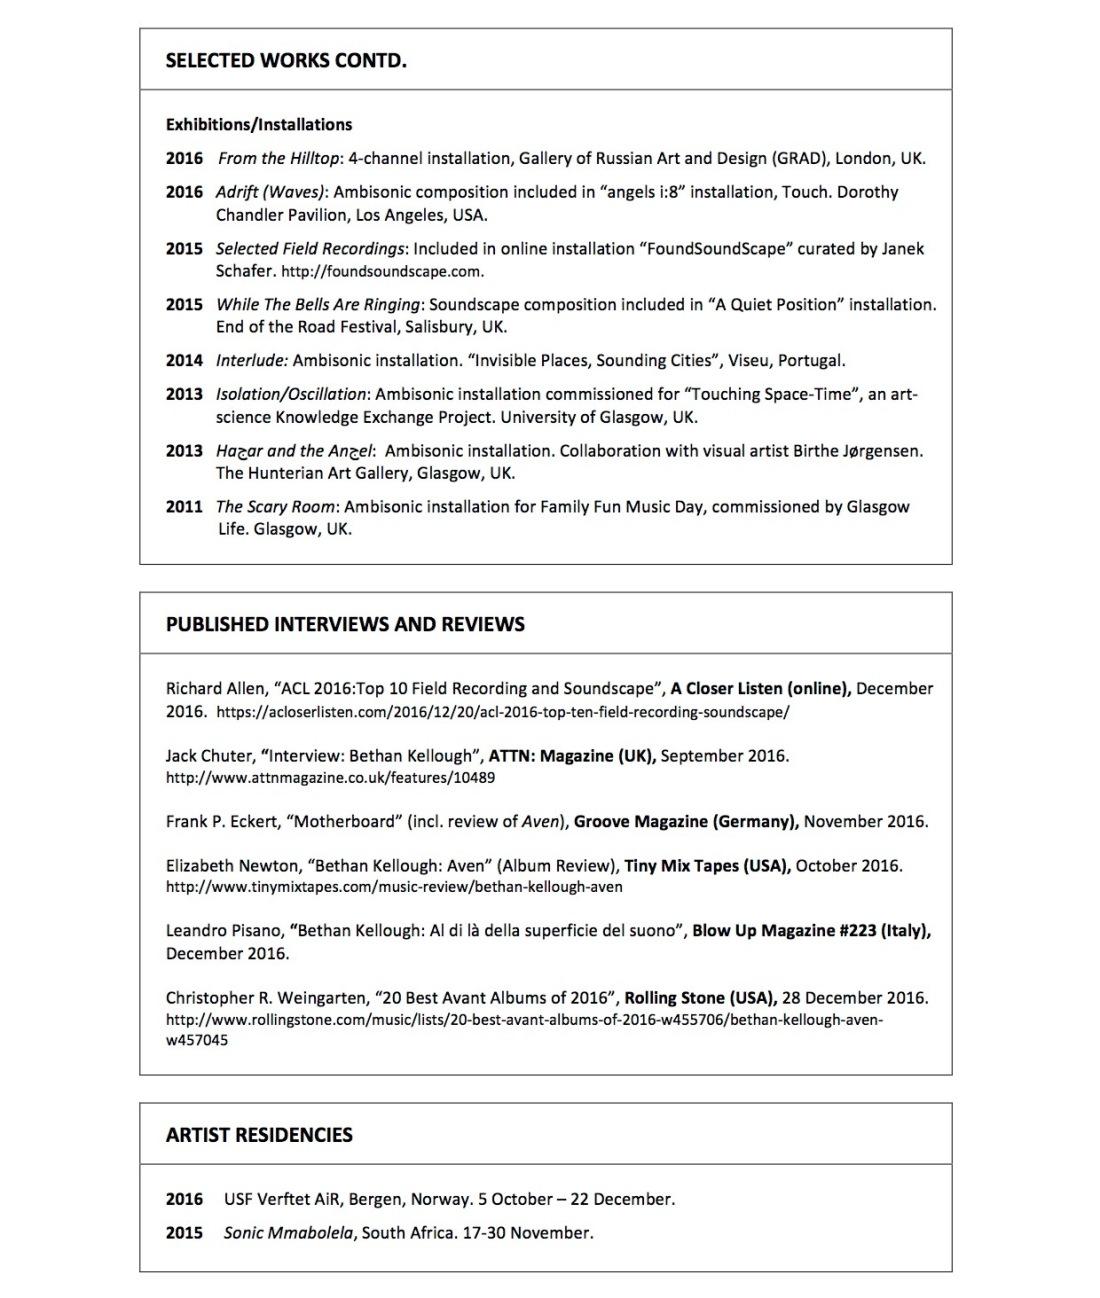 Curriculum Vitae_Dr Bethan Kellough_Composer_p2